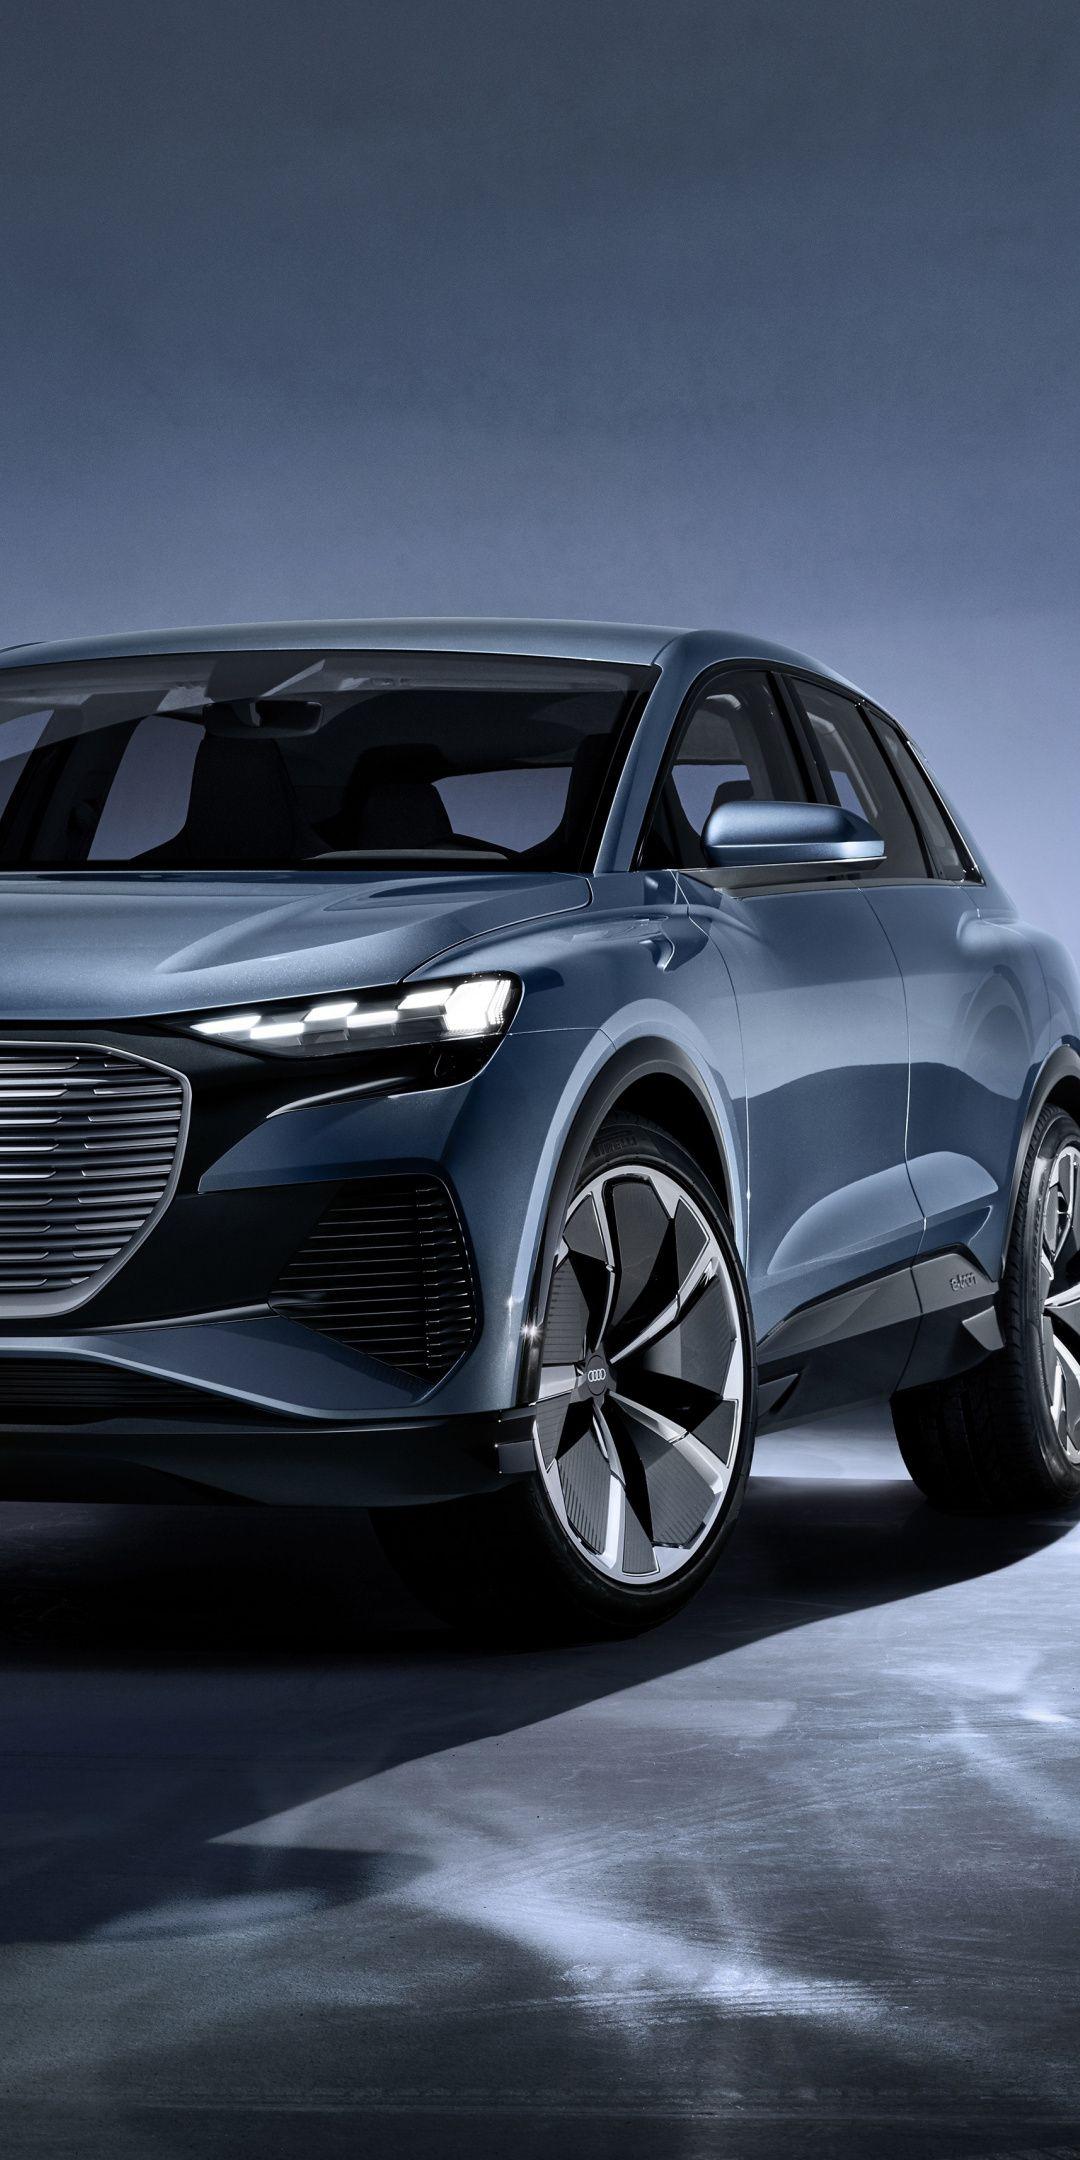 2019 Audi Q4 E Tron Concept Concept Electric Car 1080x2160 Wallpaper Audi Q4 2020 Audi Audi